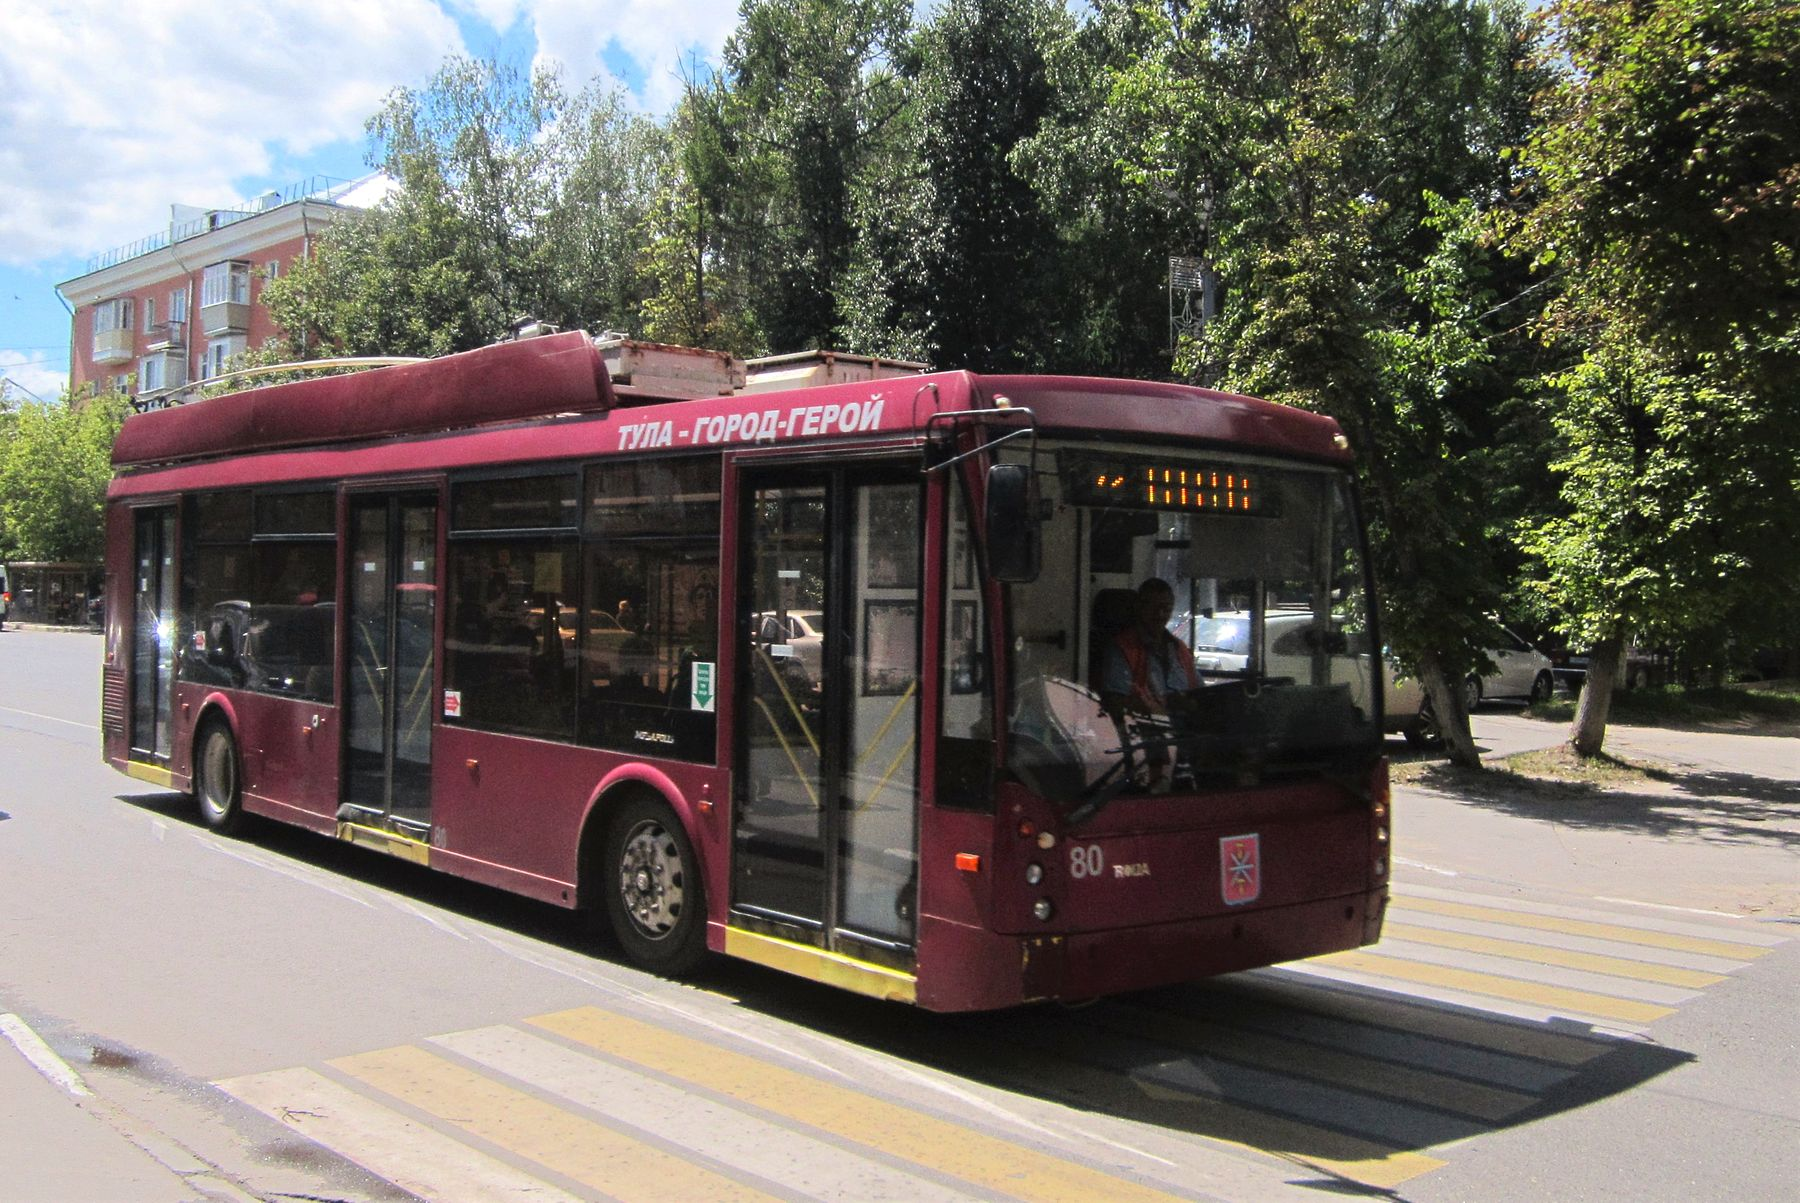 80 Тула троллейбус улица город лето